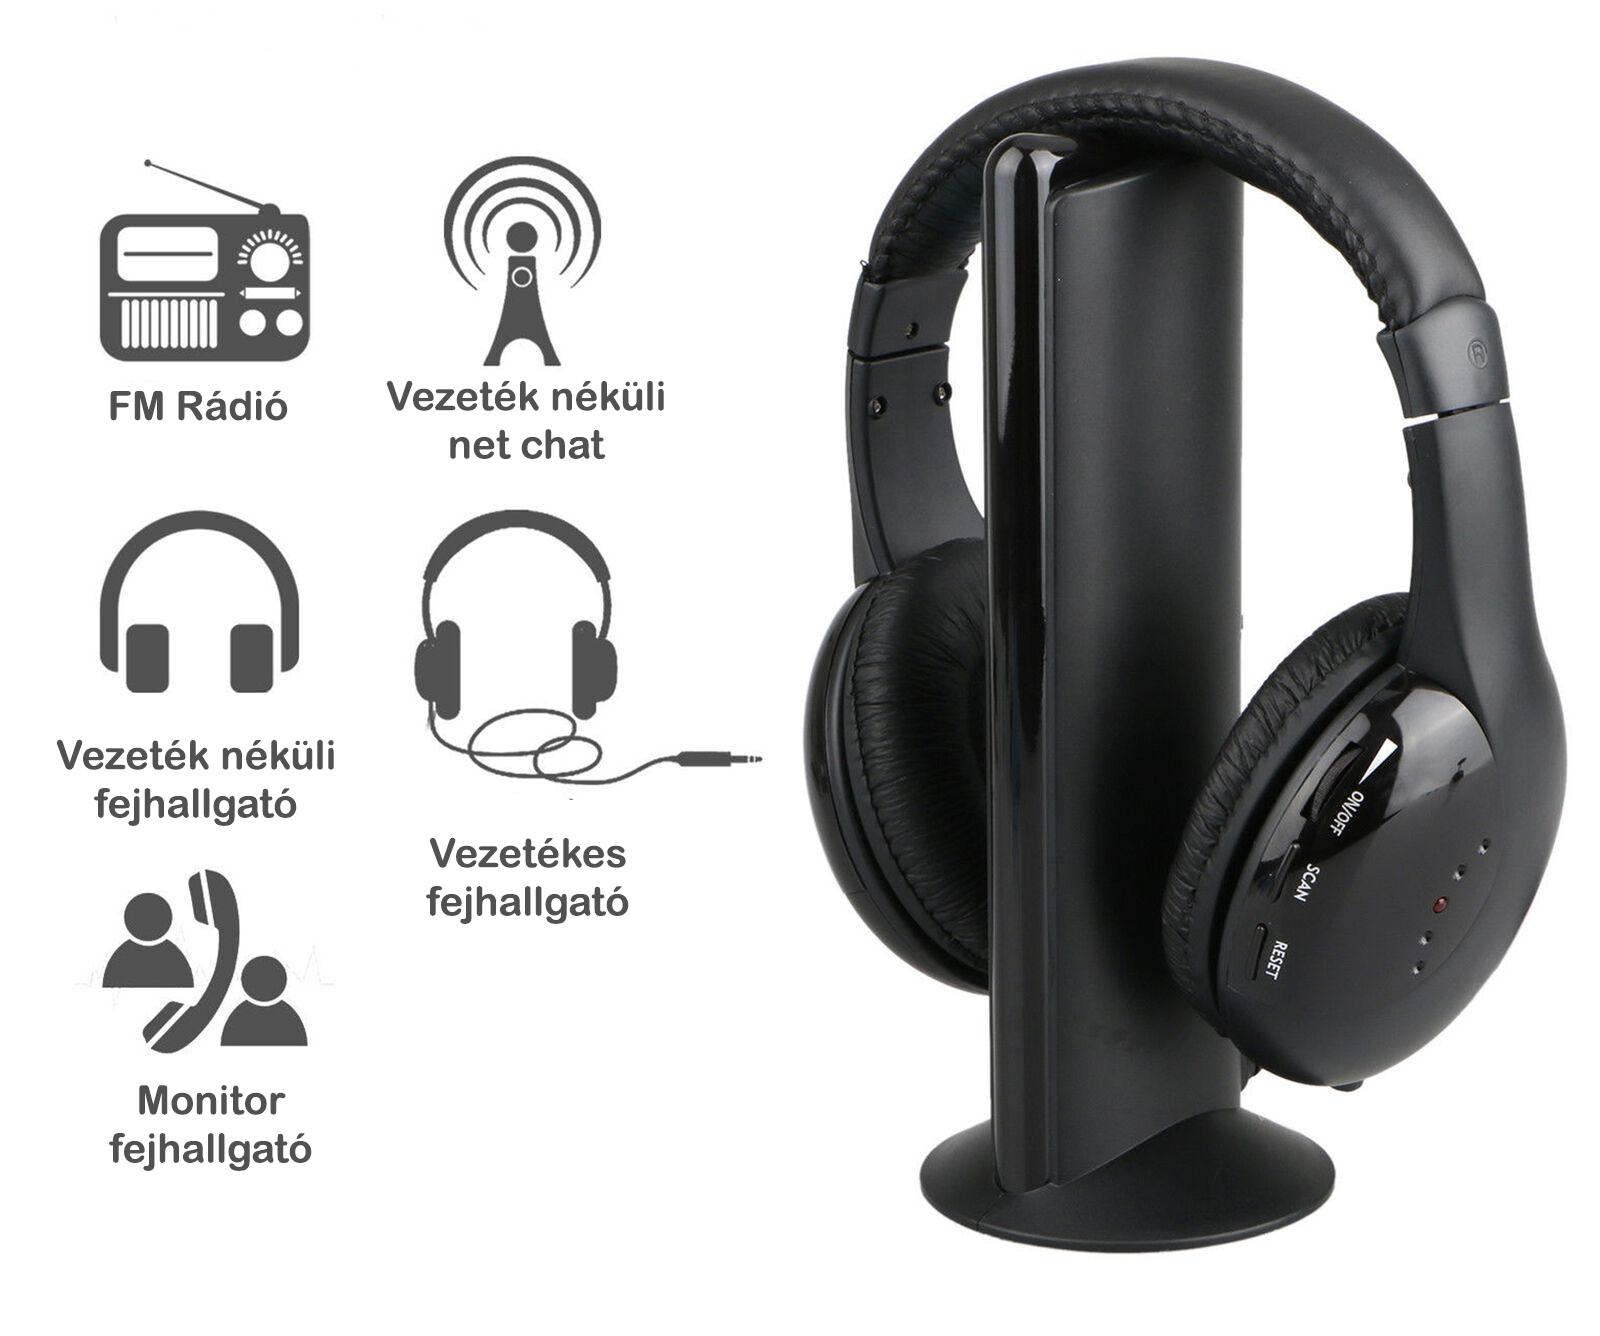 Fejhallgató01